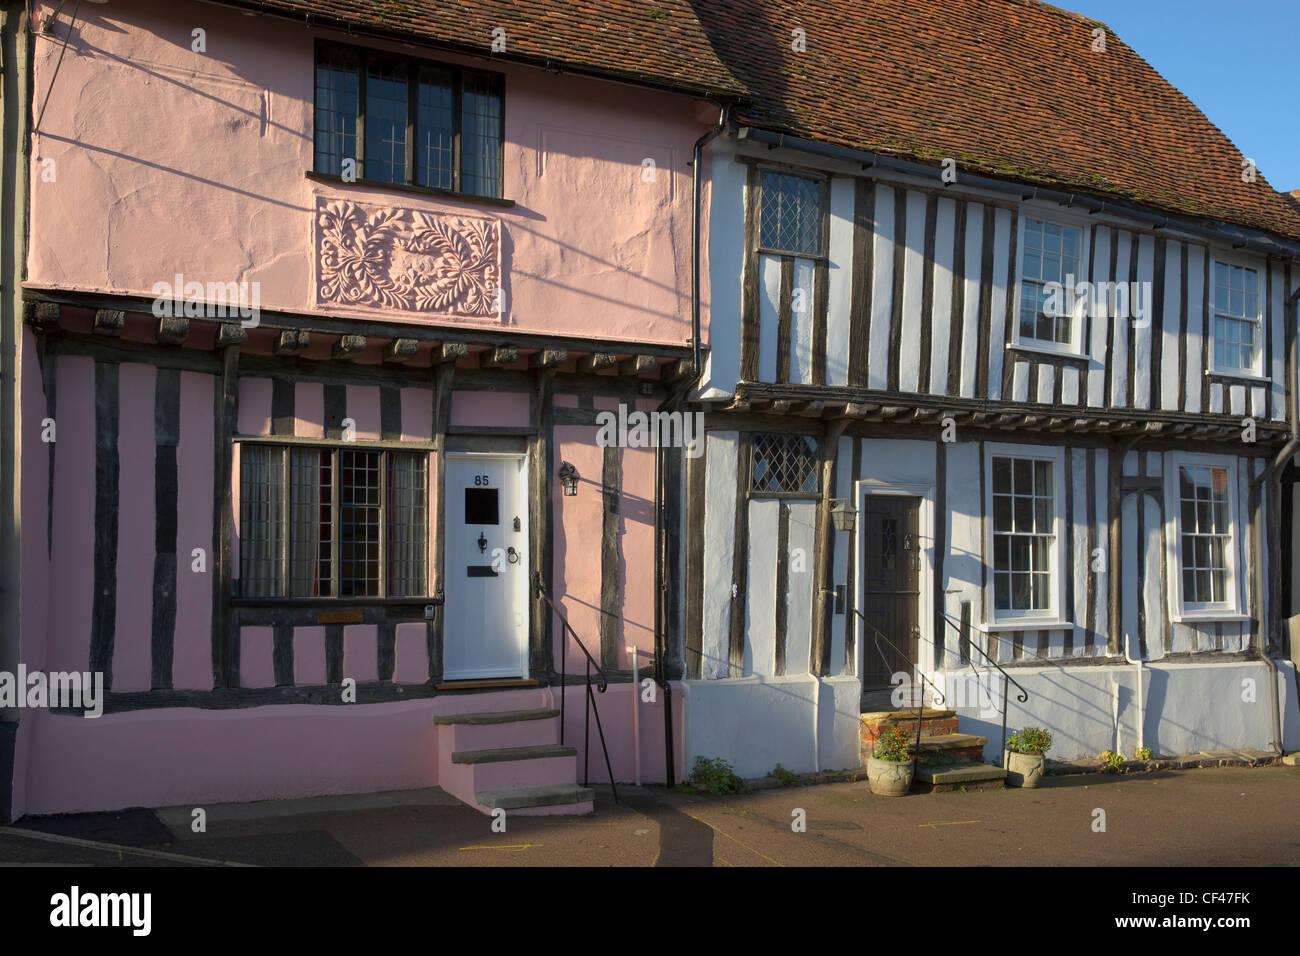 Traditional timber framed houses in Lavenham. - Stock Image